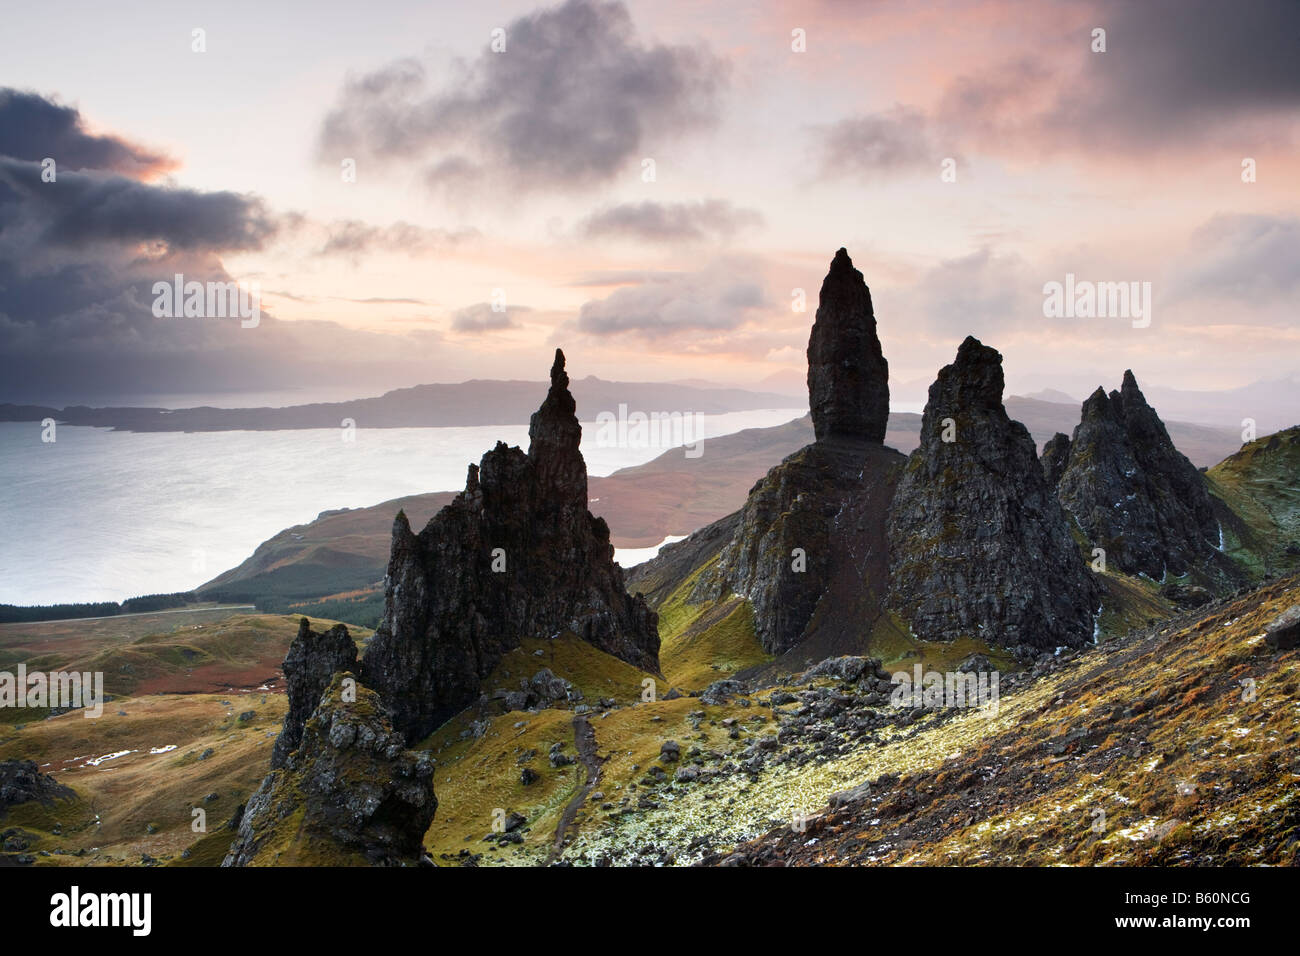 The Storr (Needle Rock and Old Man of Storr), Isle of Skye, Scotland, UK - Stock Image